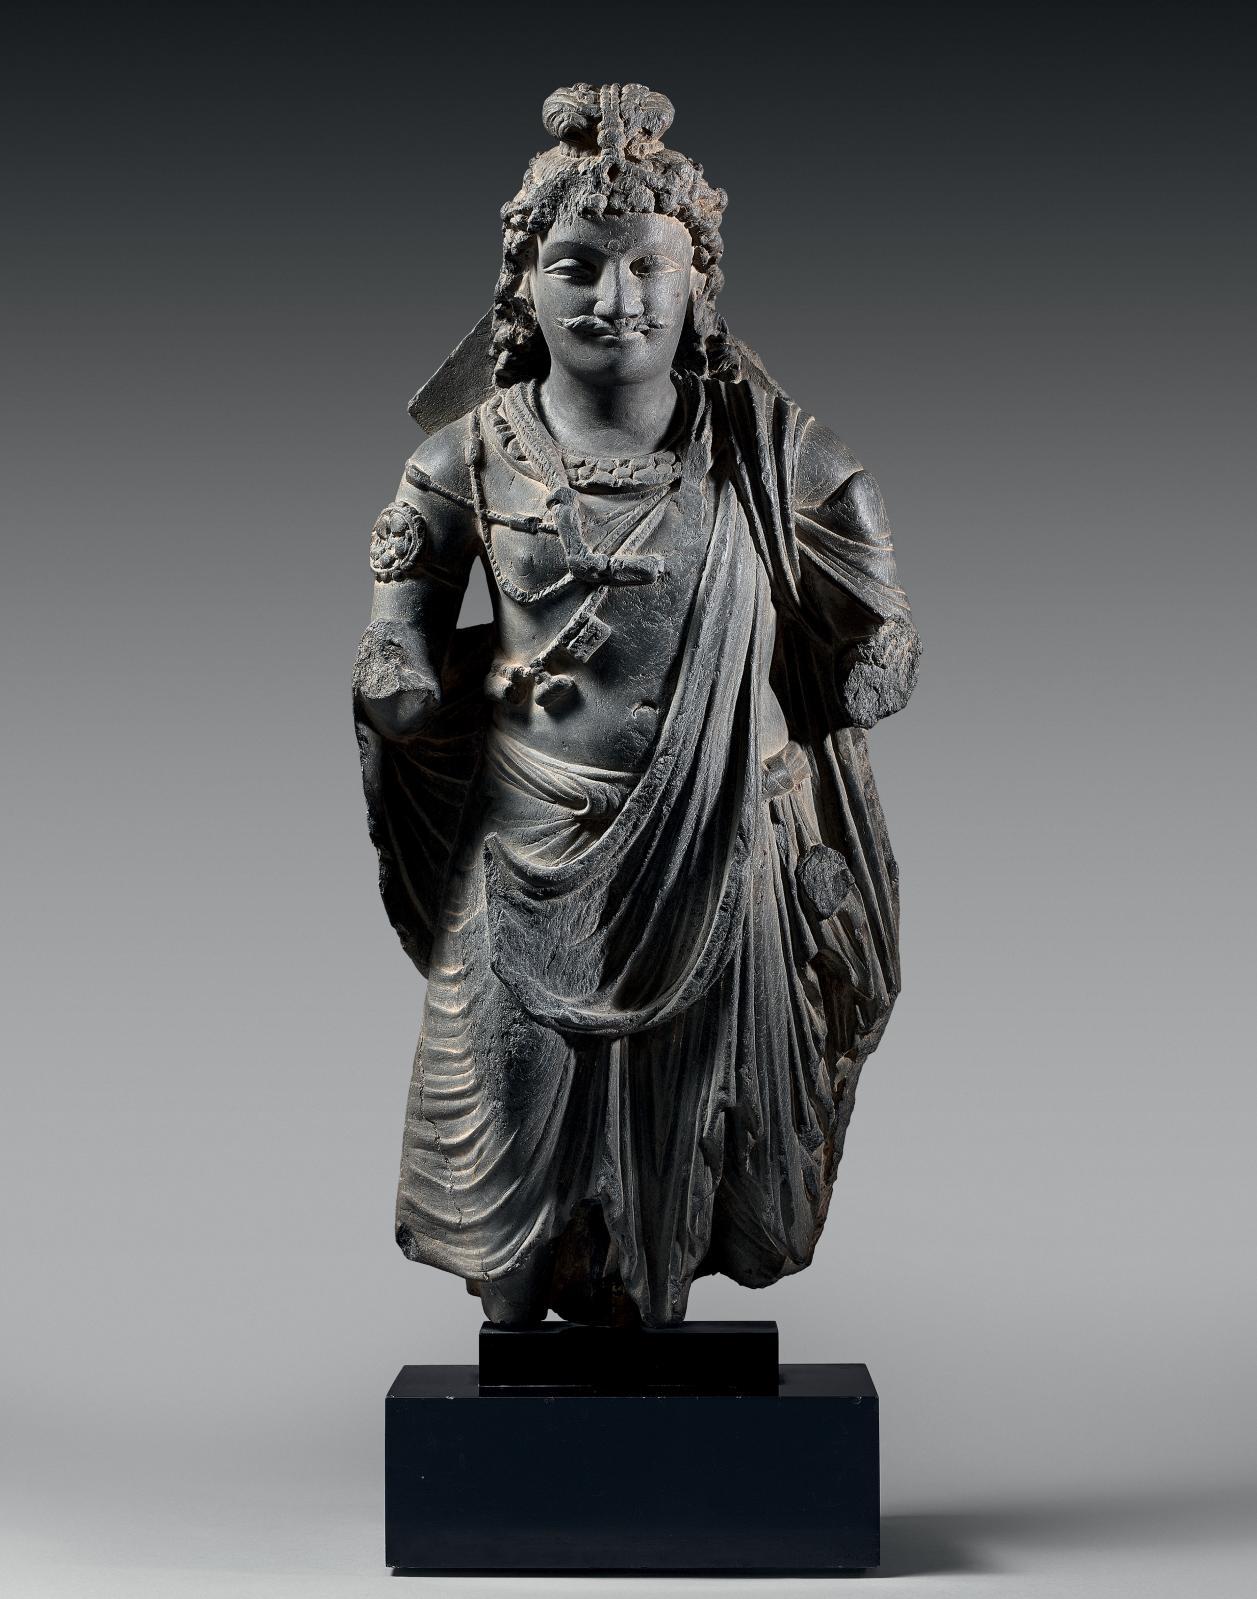 Pakistan, art gréco-bouddhique du Gandhara, IIIesiècle. Maitreya en schiste gris, h.60cm. Galerie Renaud Montméat Art d'Asie, Paris. Courtesy Galer